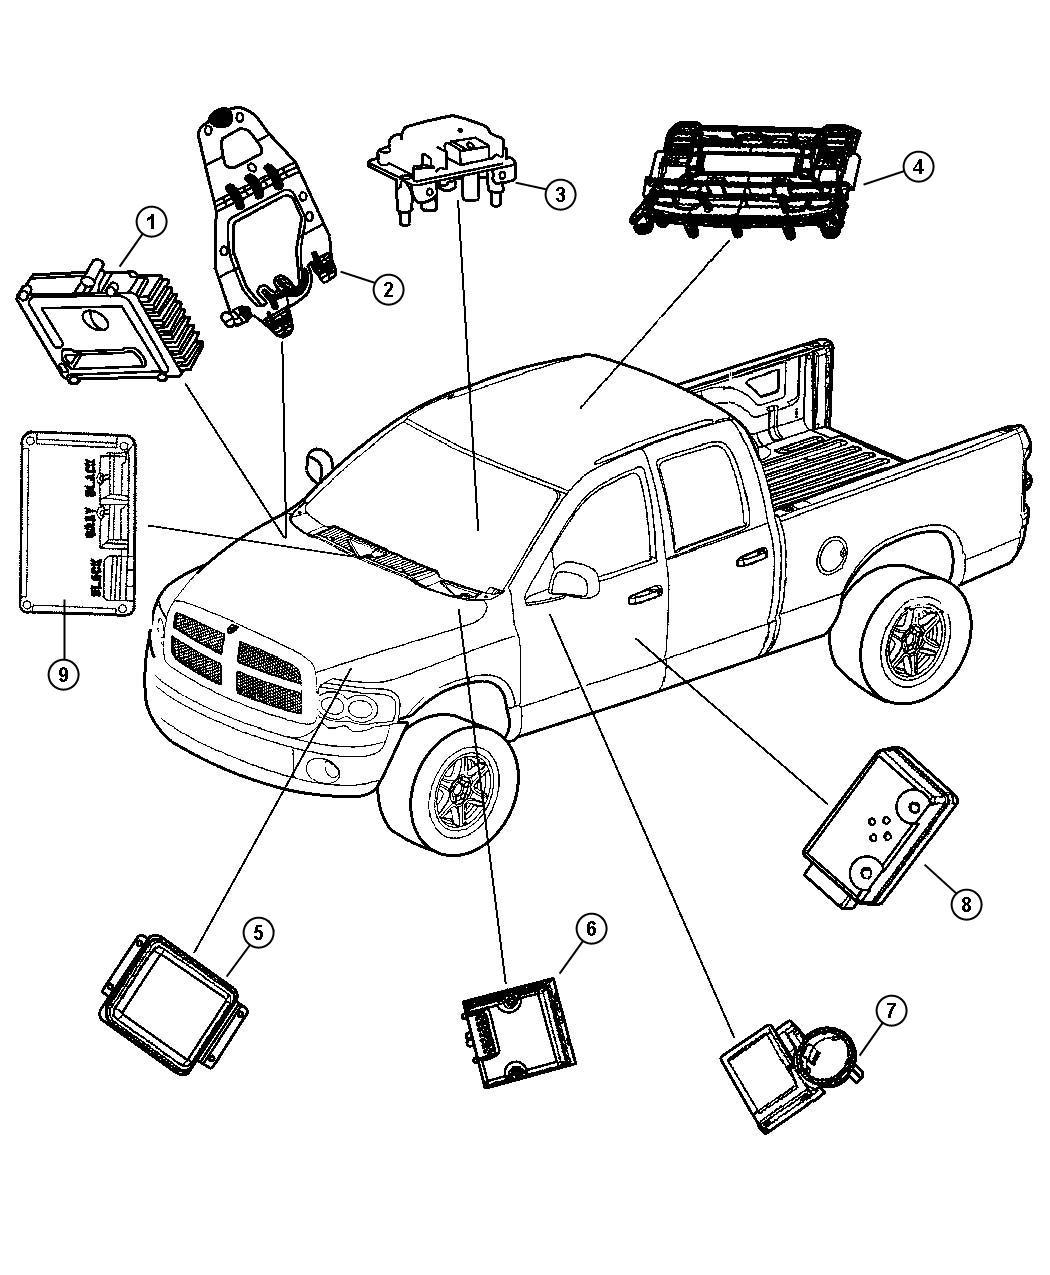 291165649359 moreover 322364483870 besides 2000 Dodge Dakota Parts Diagram moreover Index cfm furthermore 231694861017. on genuine dodge parts